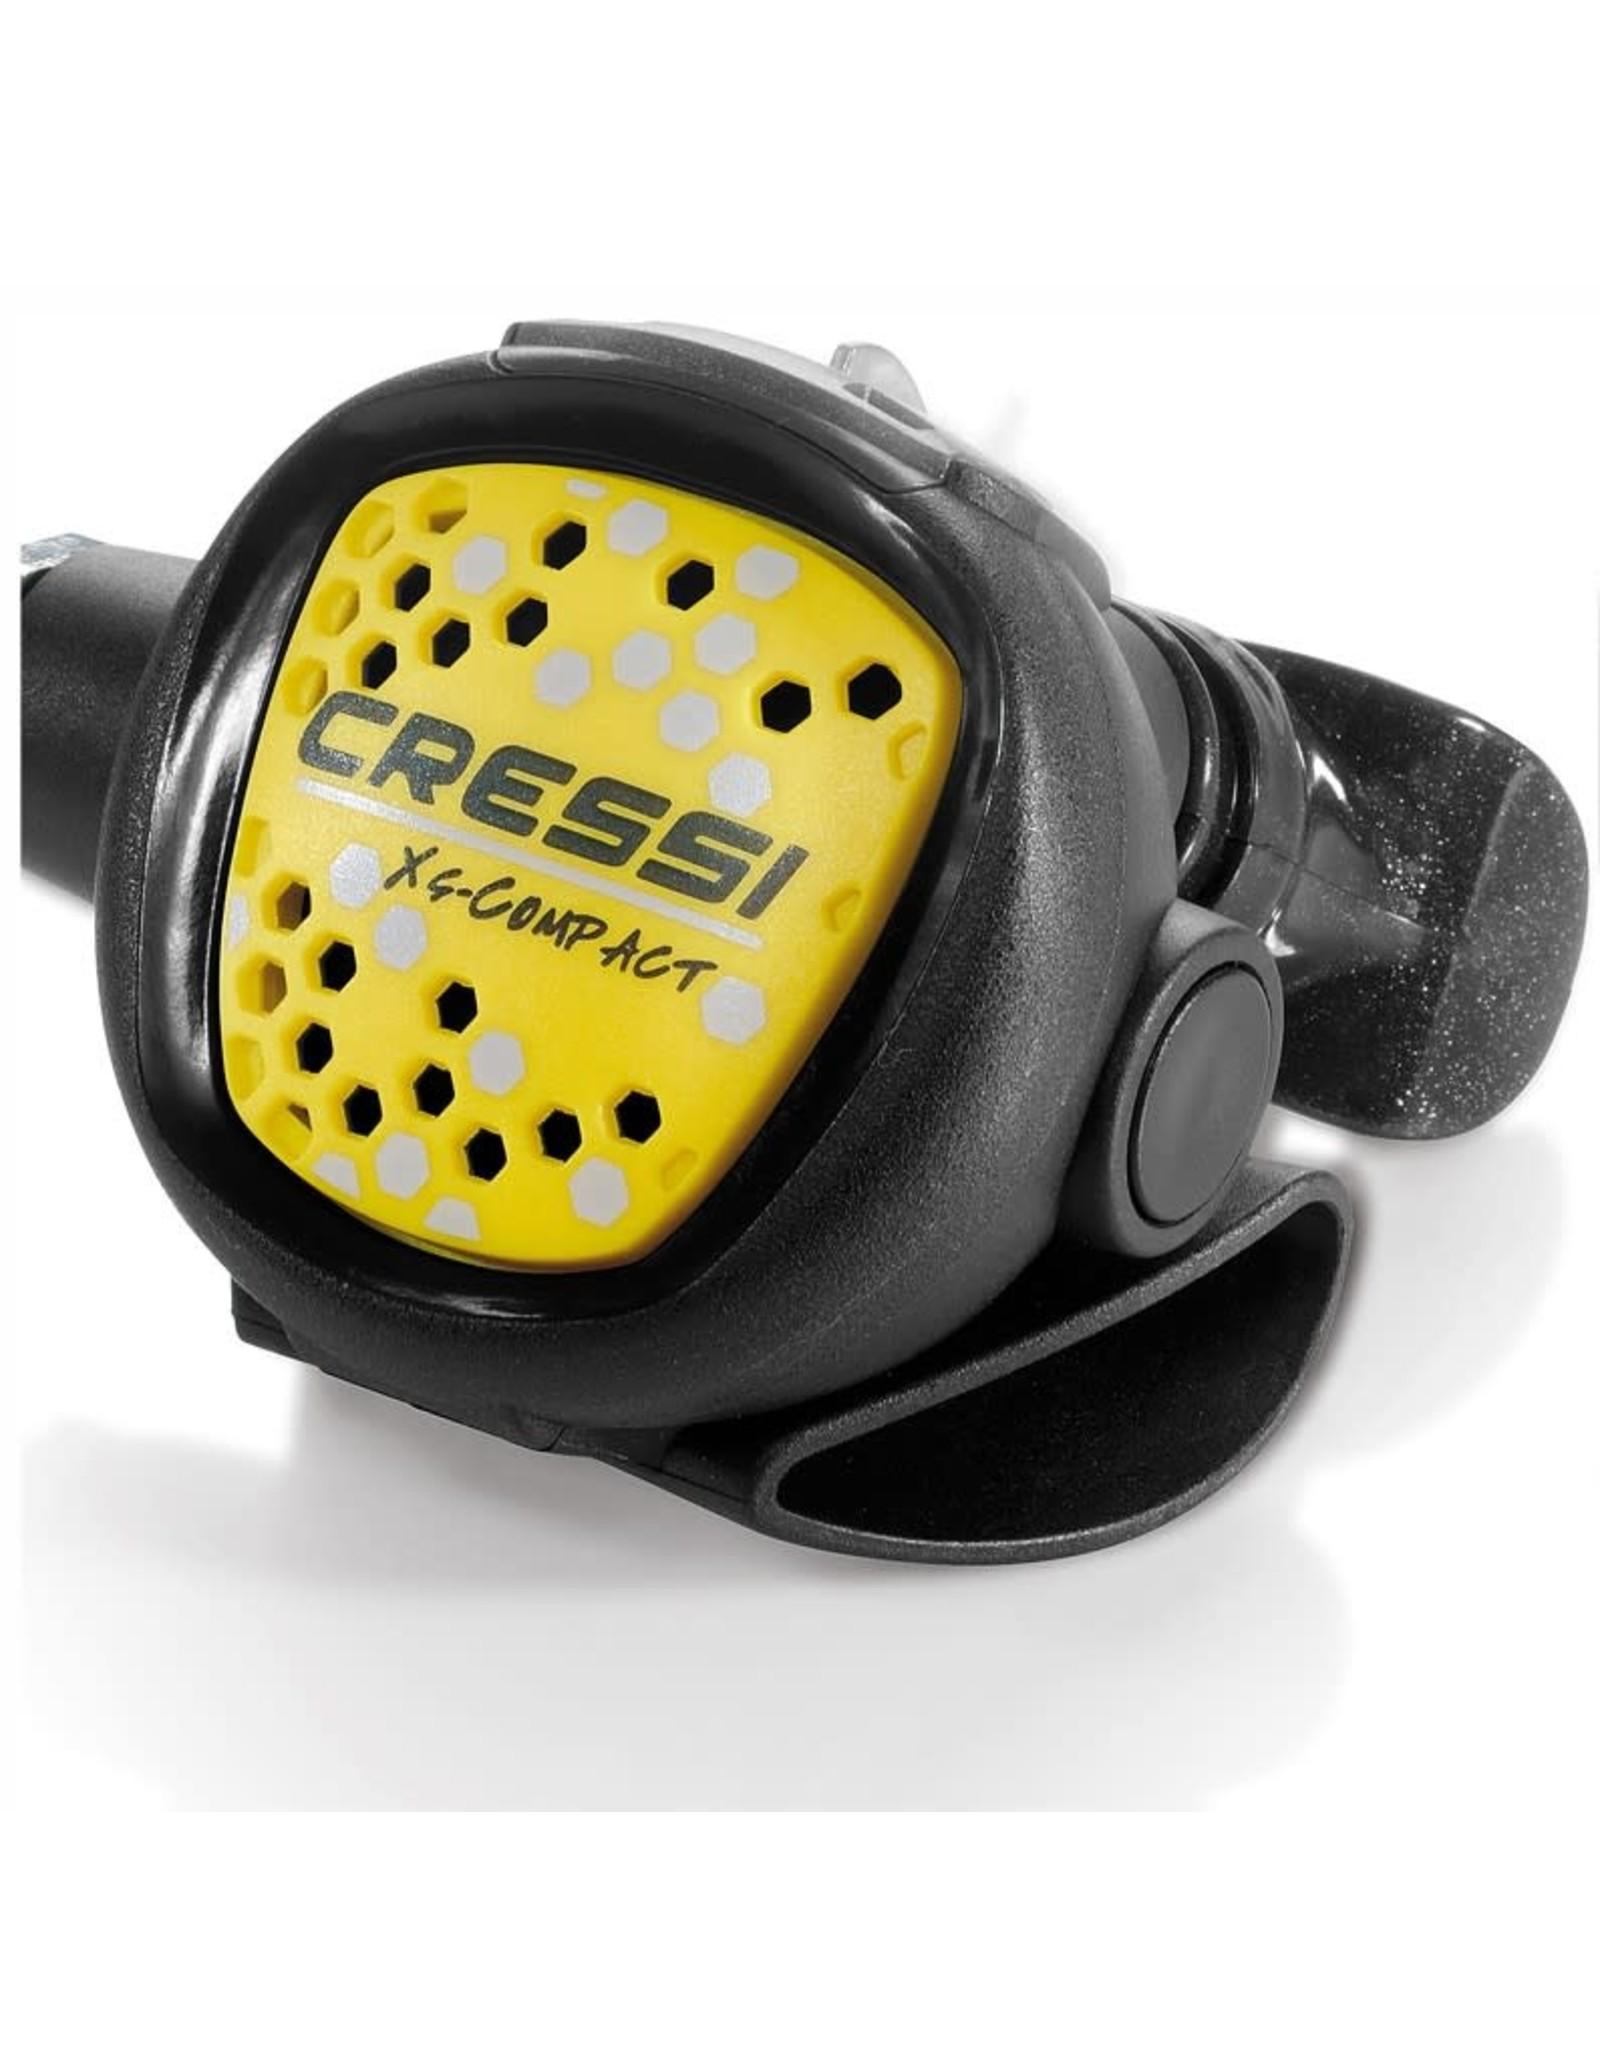 Cressi Cressi AC2 Compact + Octo Compact